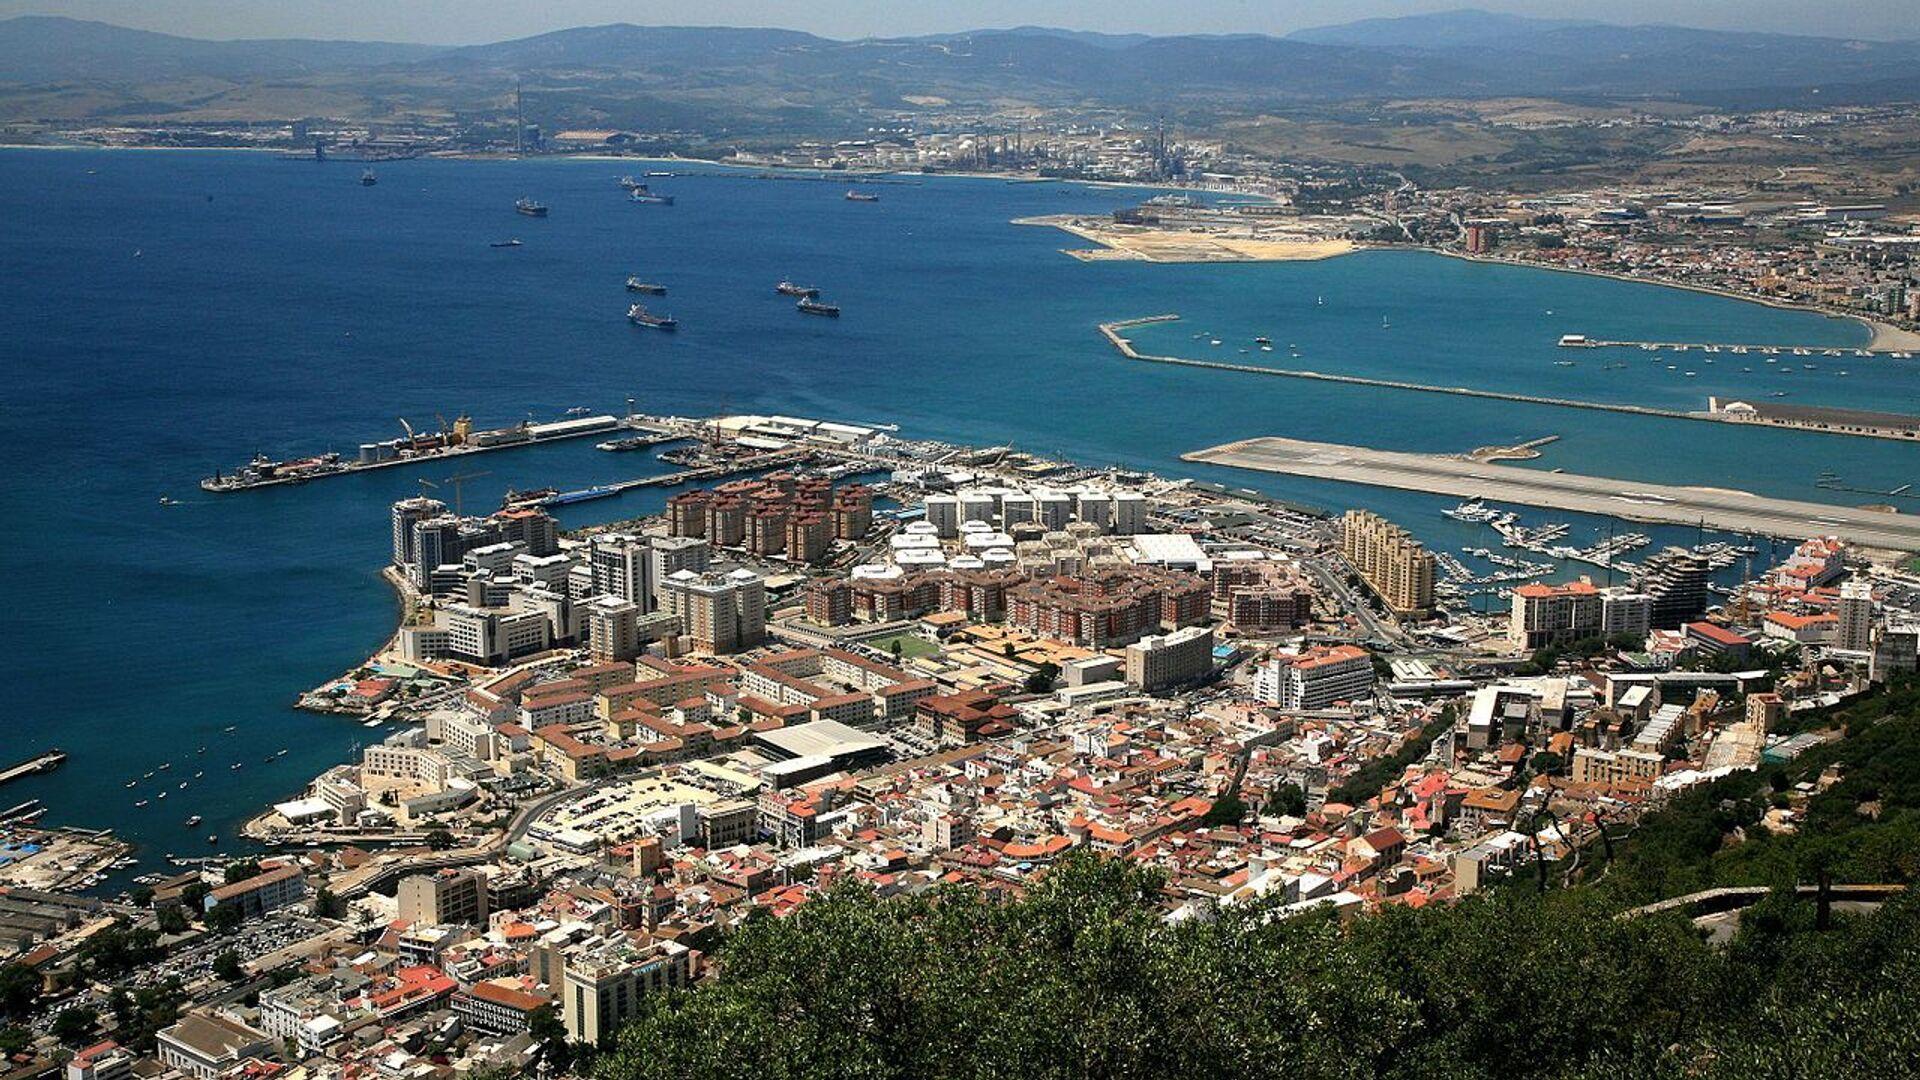 Gibilterra - Sputnik Italia, 1920, 21.07.2021